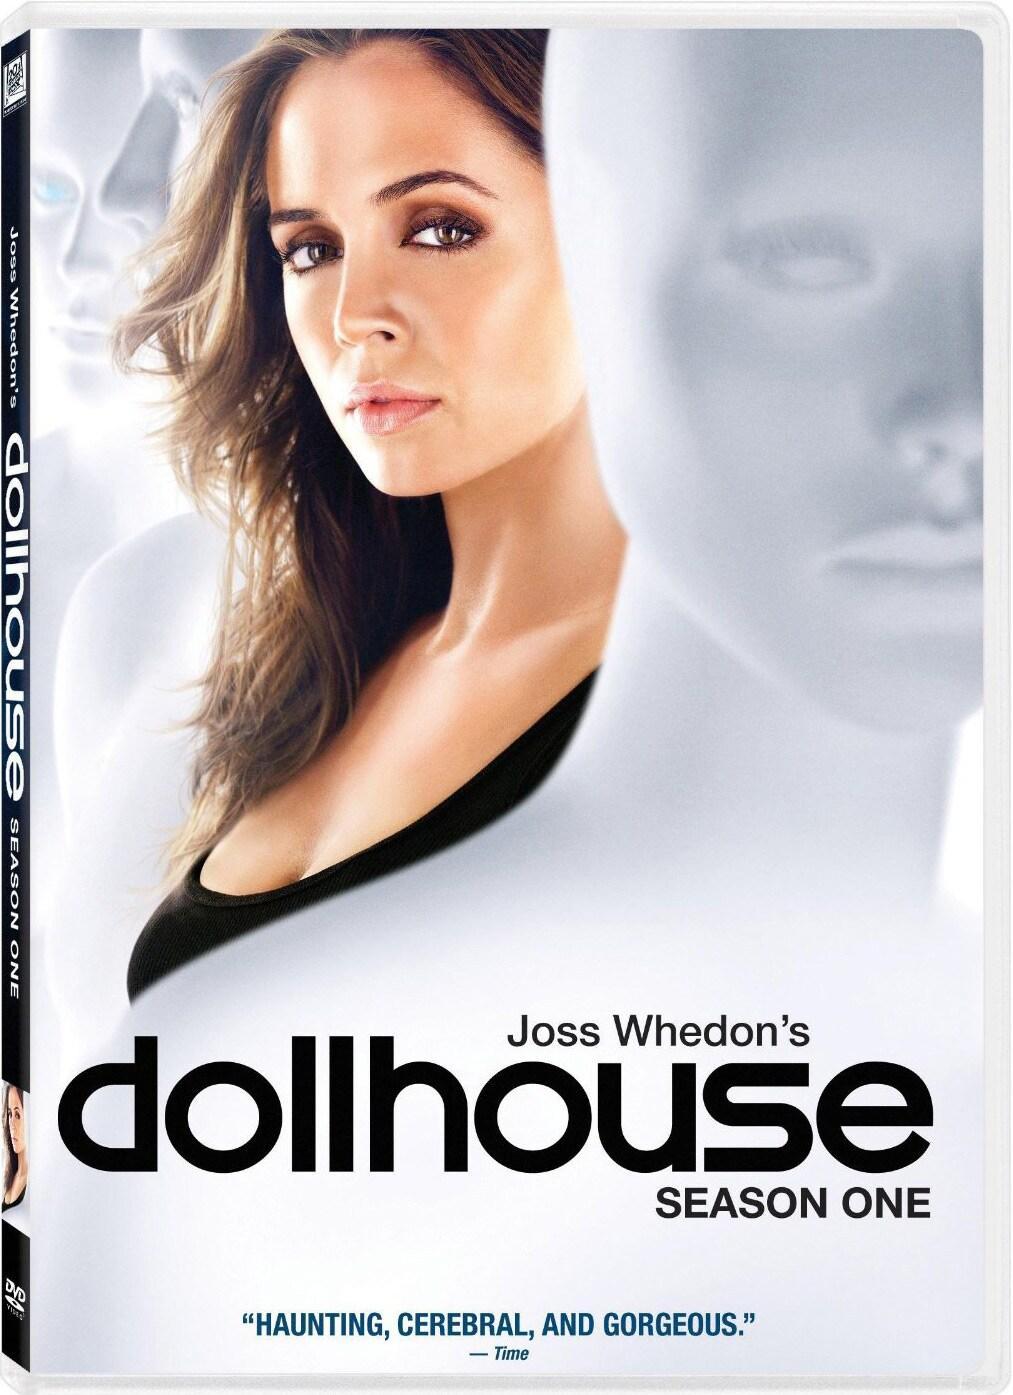 Dollhouse: Season 1 (DVD)